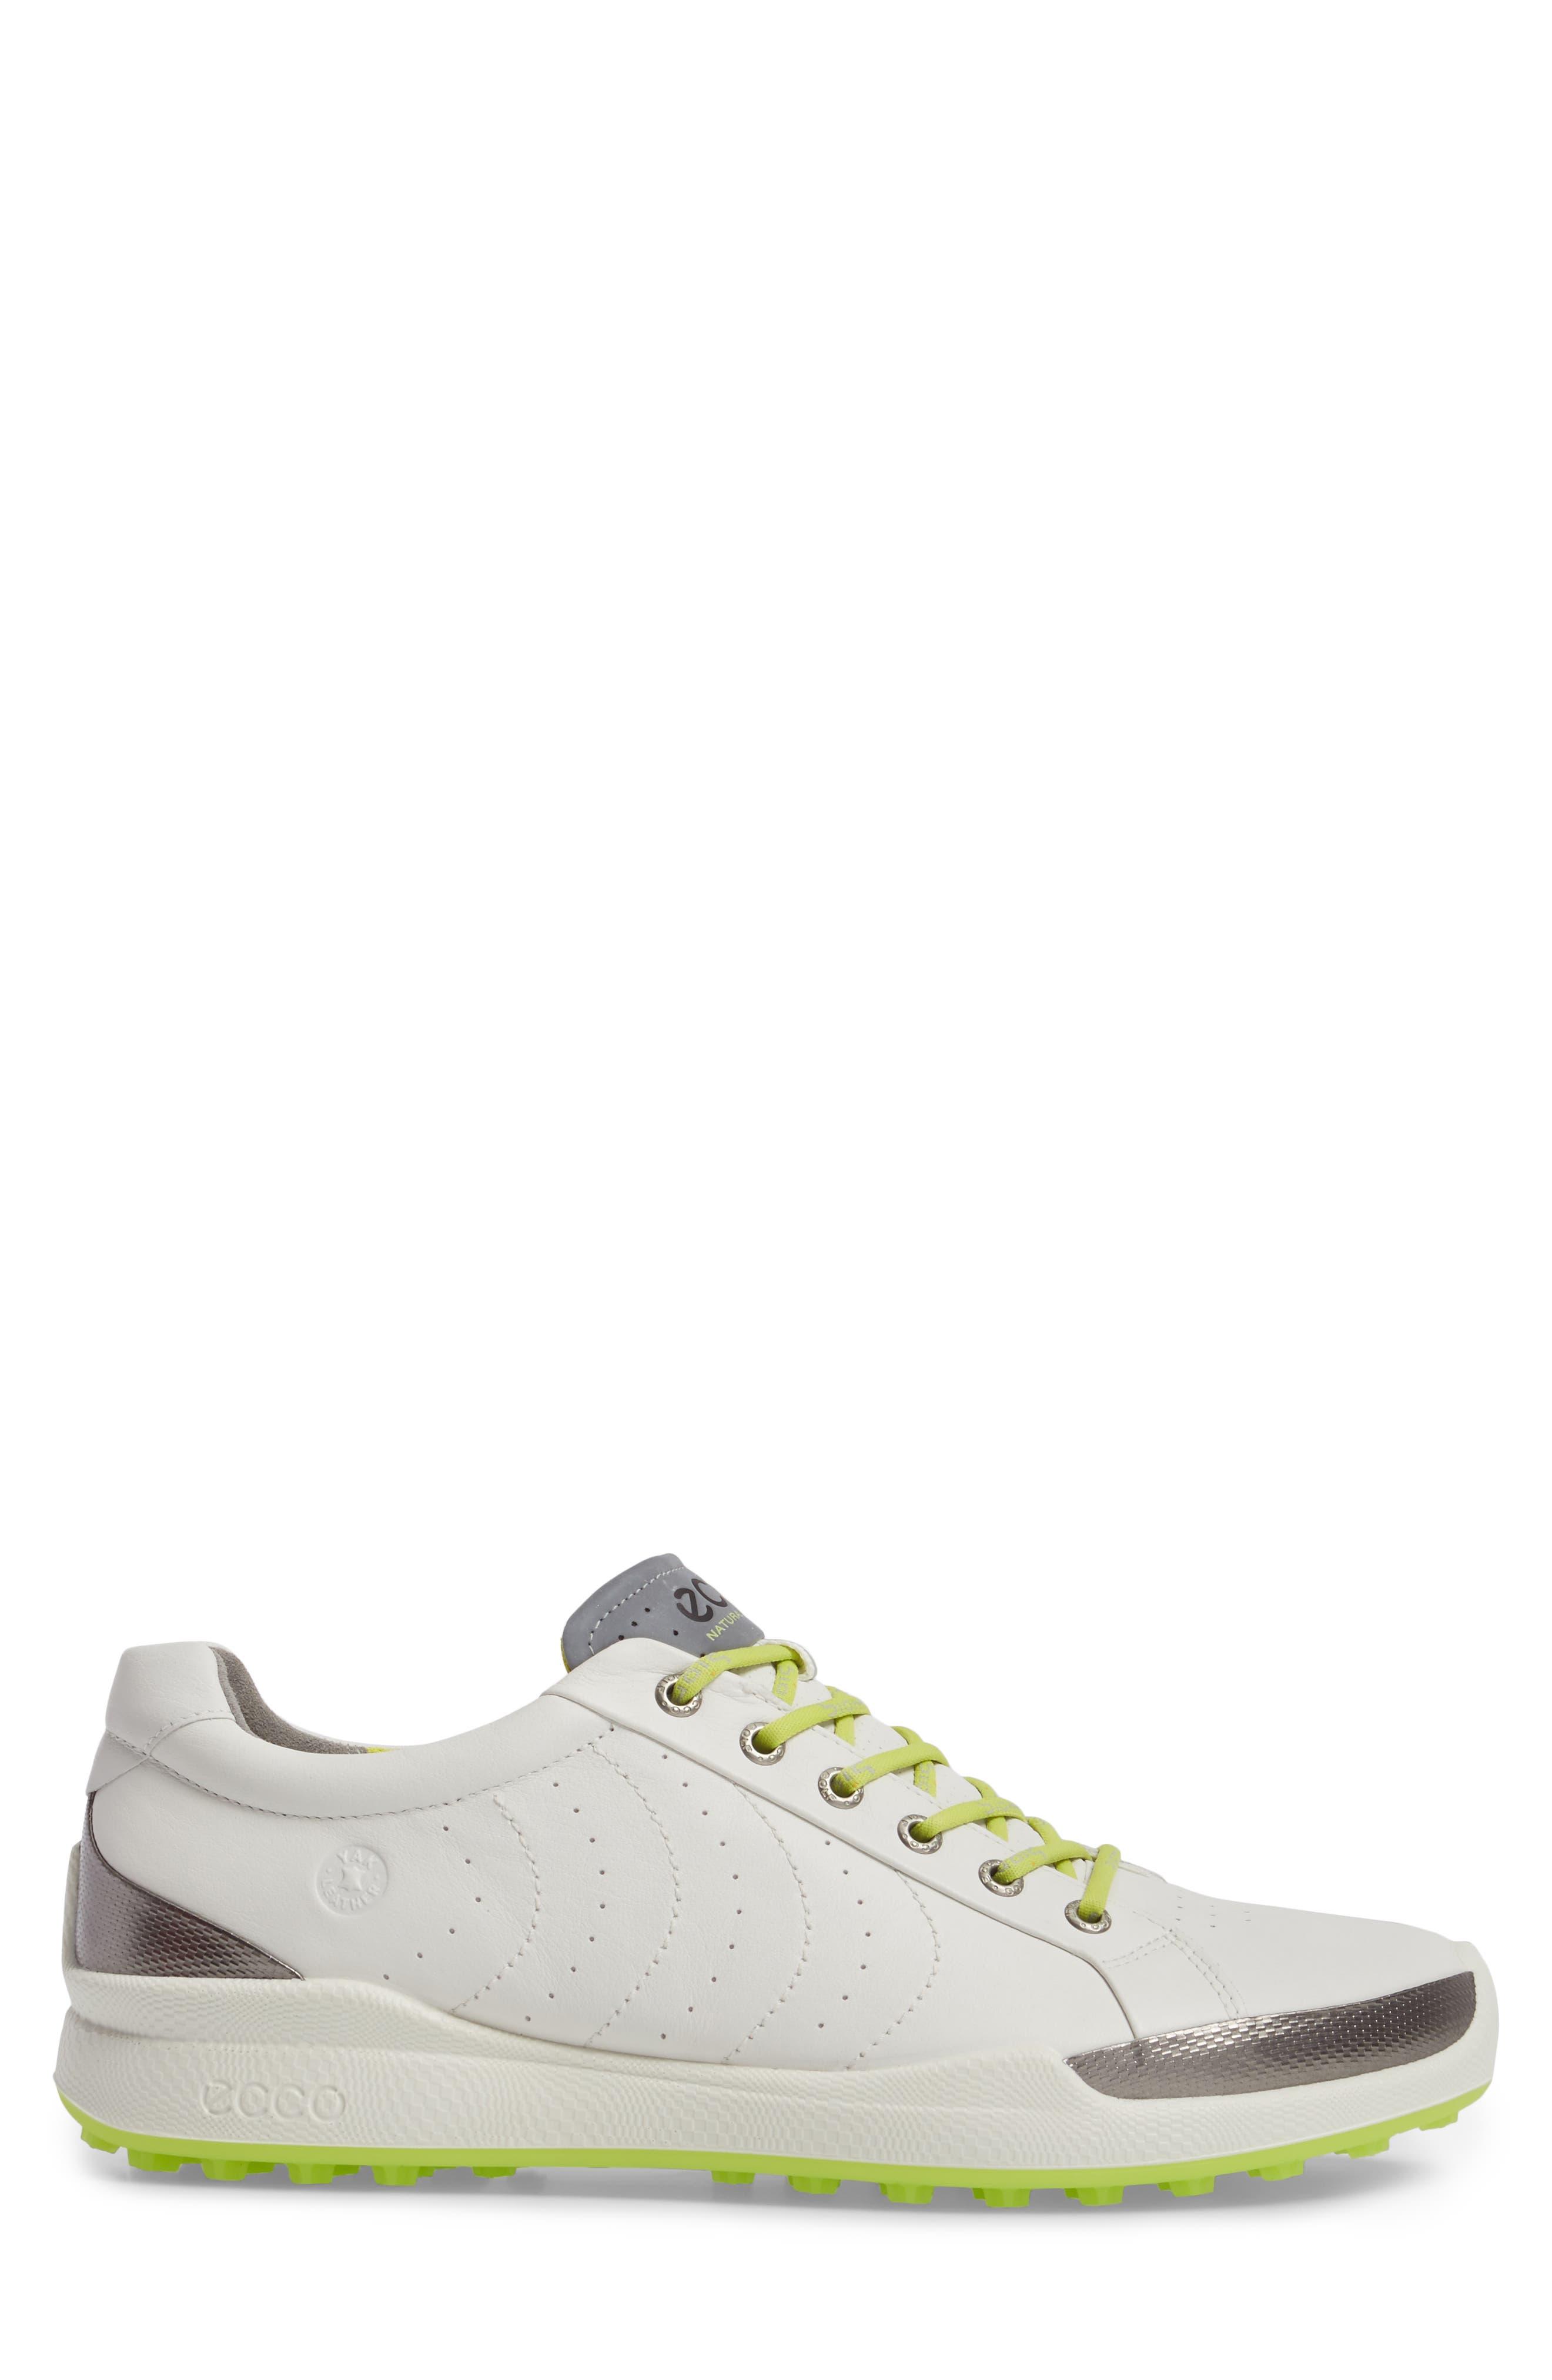 Alternate Image 3  - ECCO 'Biom Hybrid' Golf Shoe   (Men)